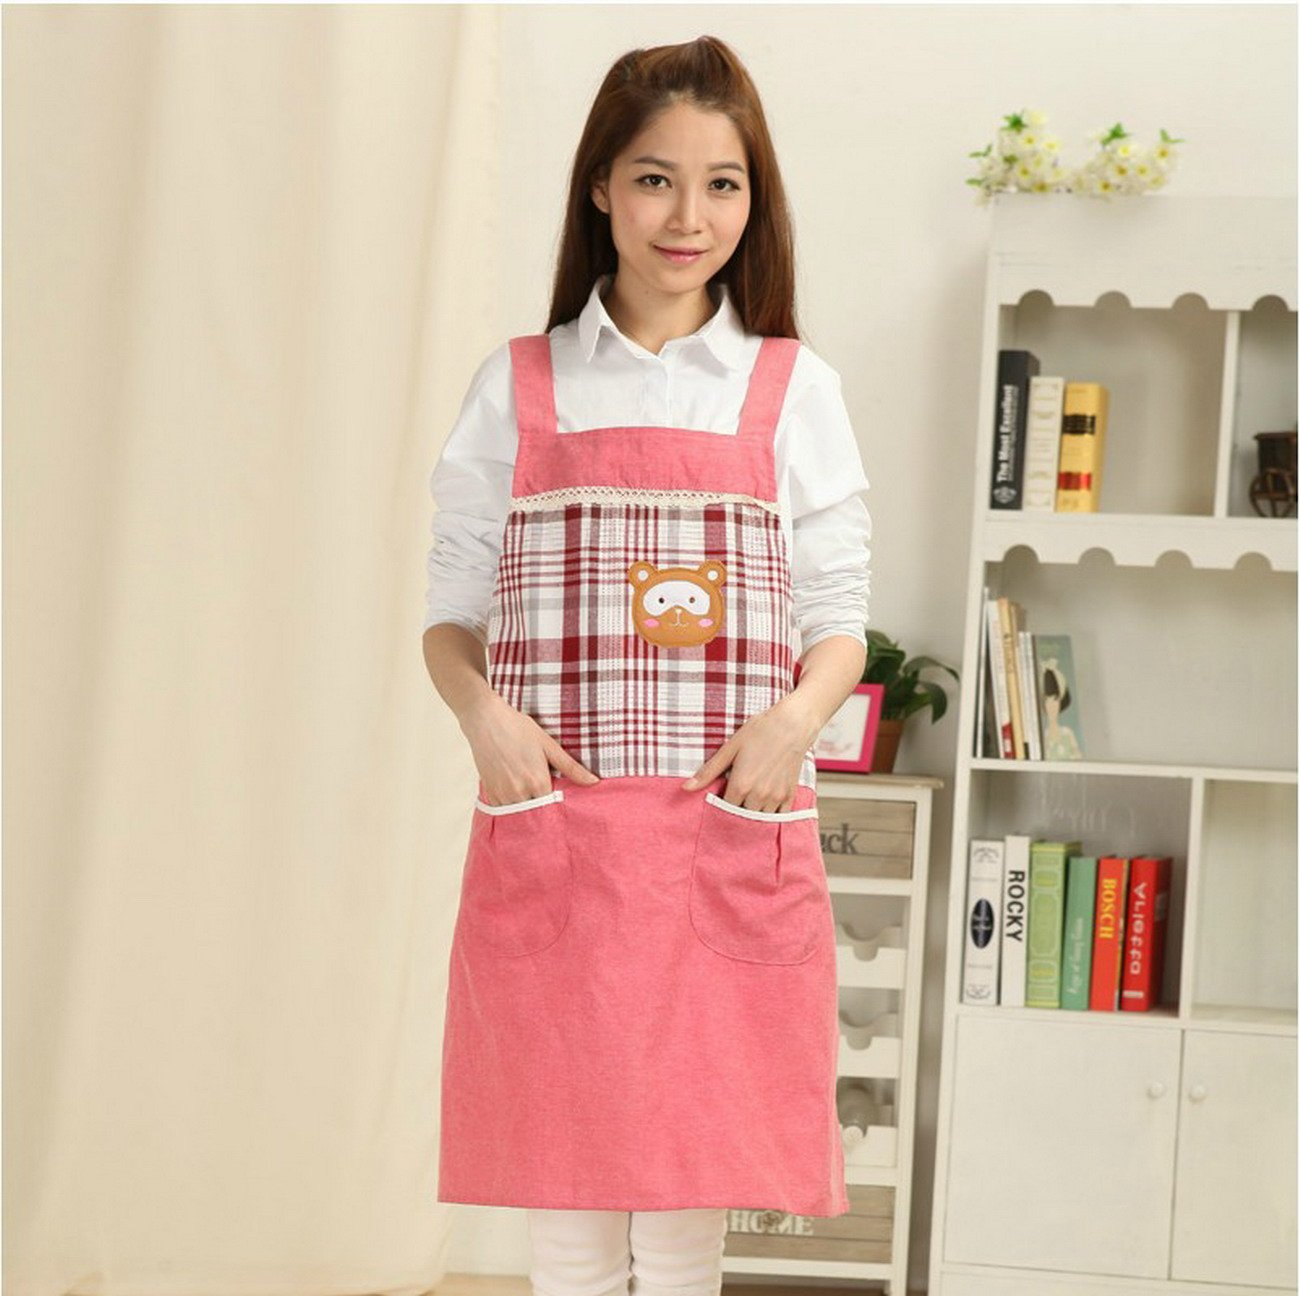 Geranjie新しいメス服カフェキッチン料理BakingエプロンTea Shopホームファッションキュートコットンエプロンfor Woman印刷ロゴ   B078S4W4GG